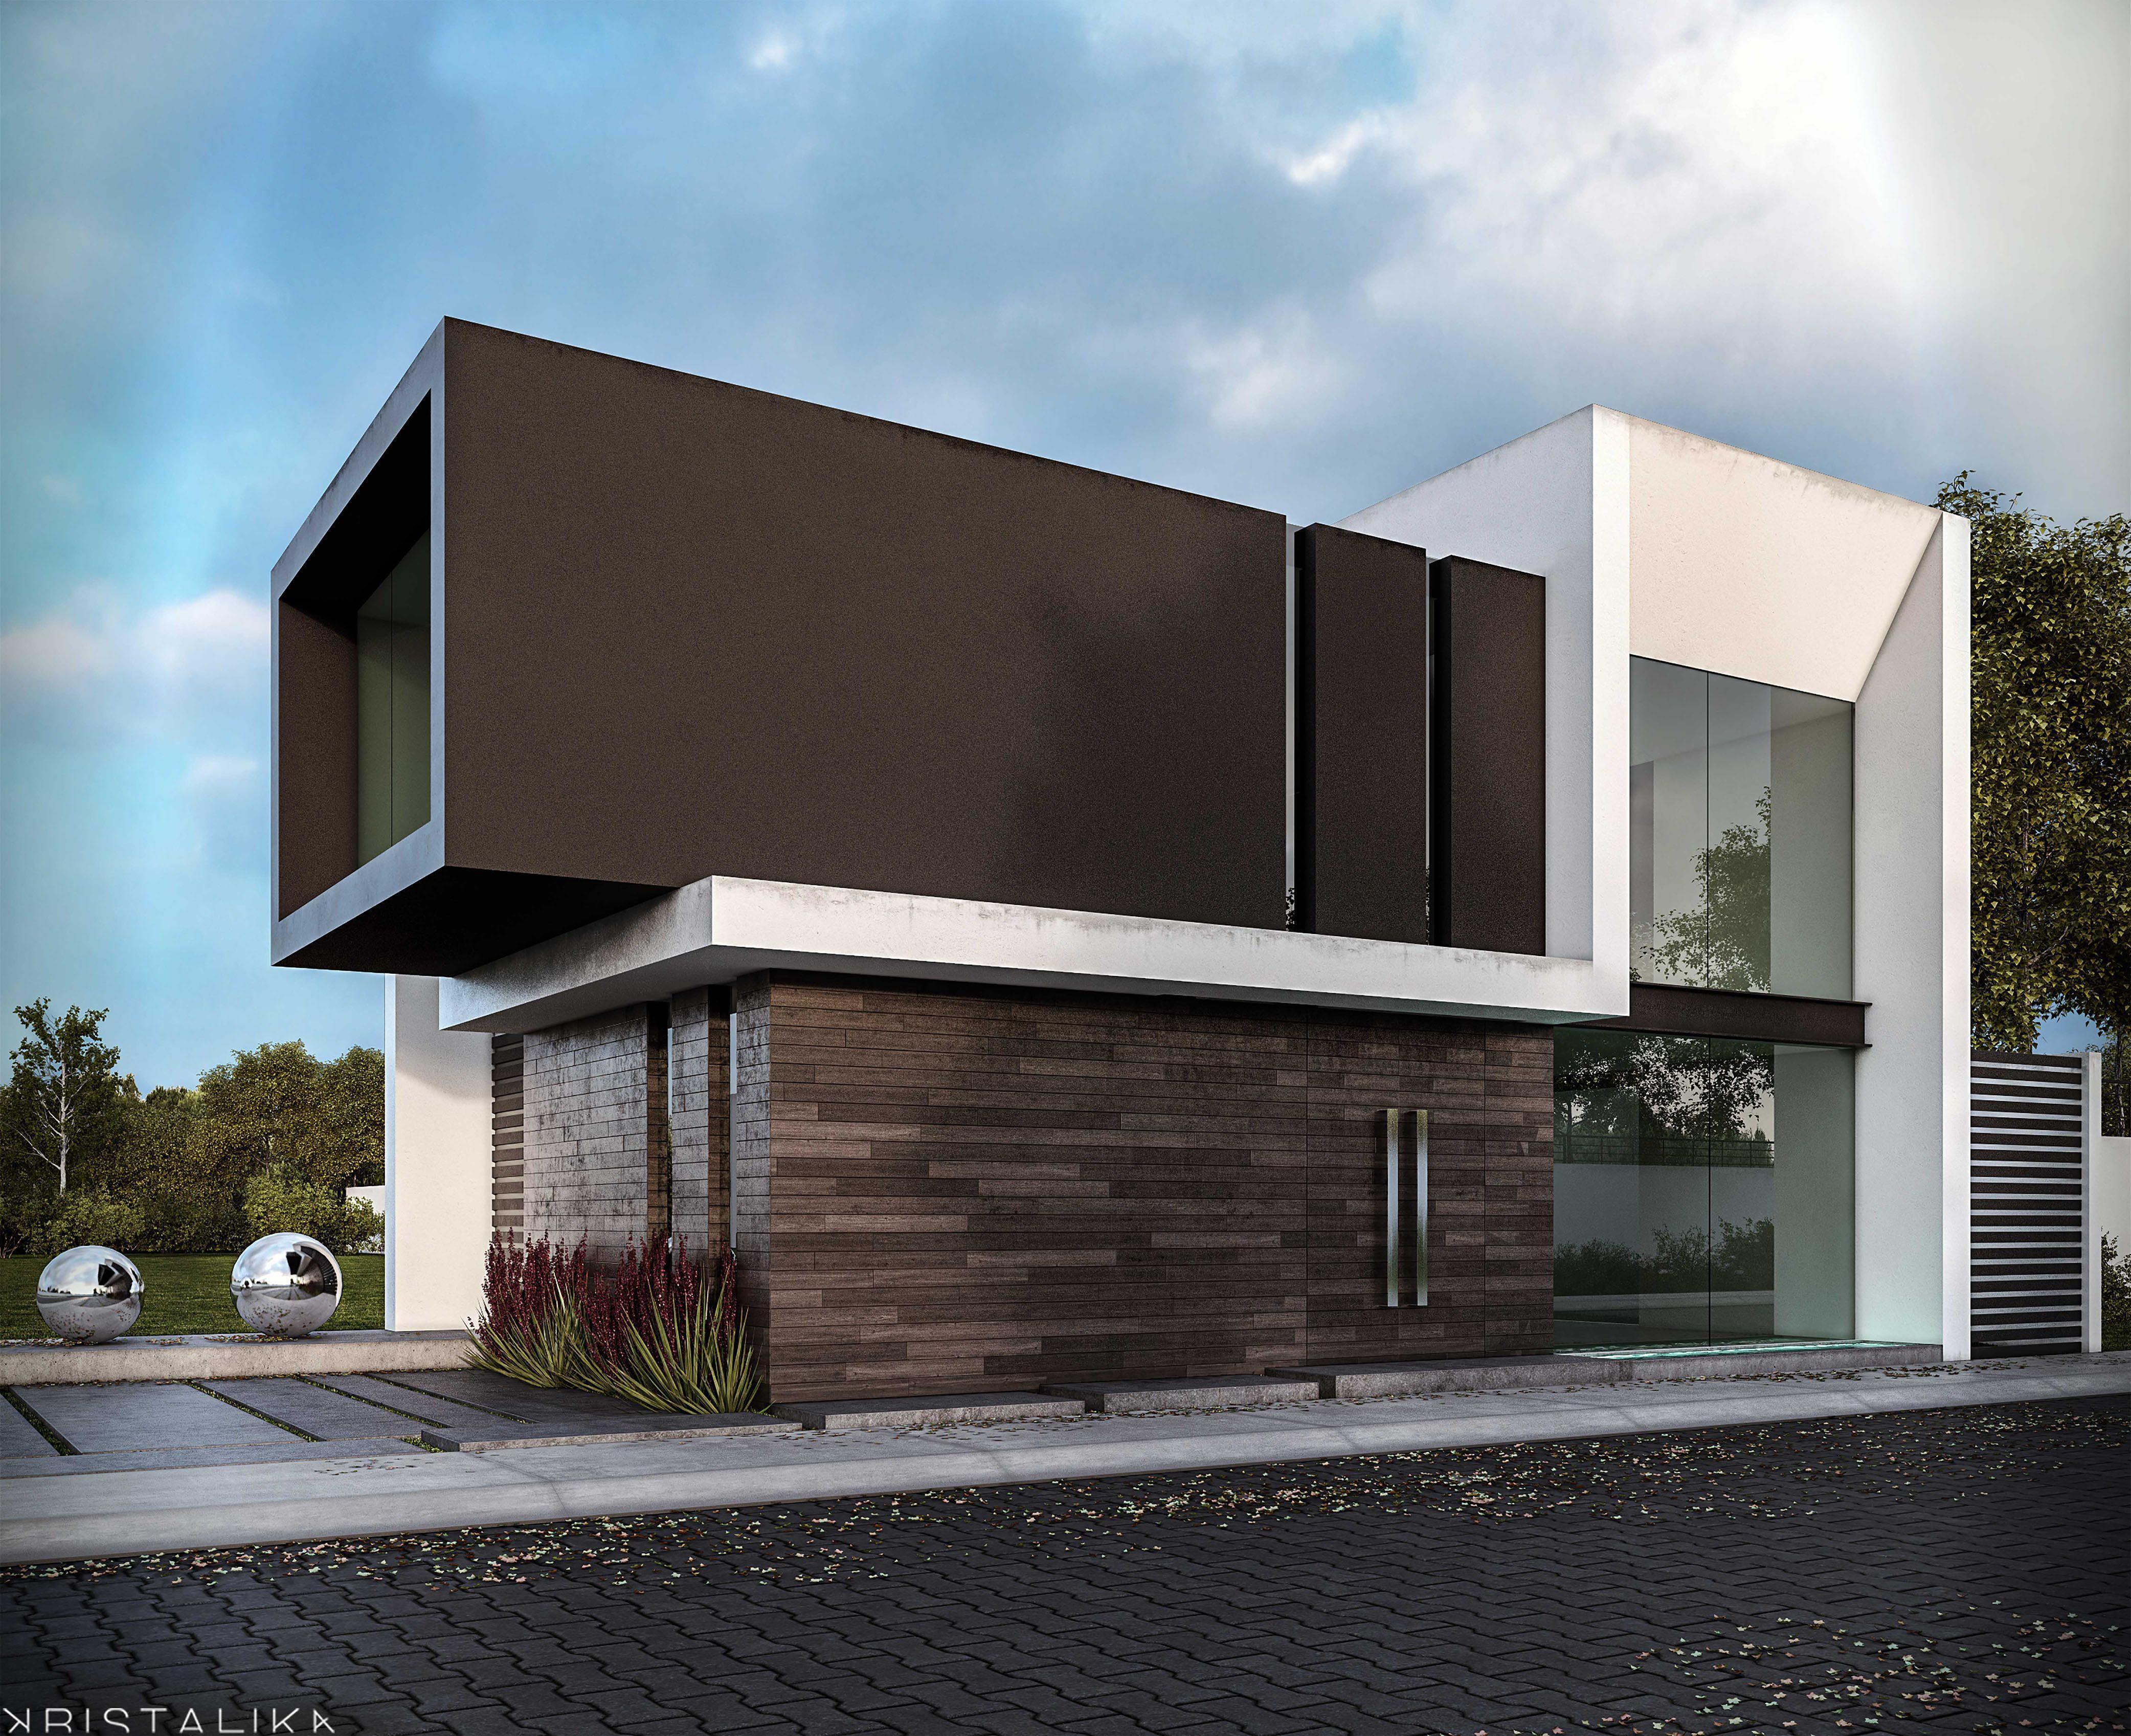 Rsi 1 house arquitectura casas dise o de fachadas y for Design minimalista